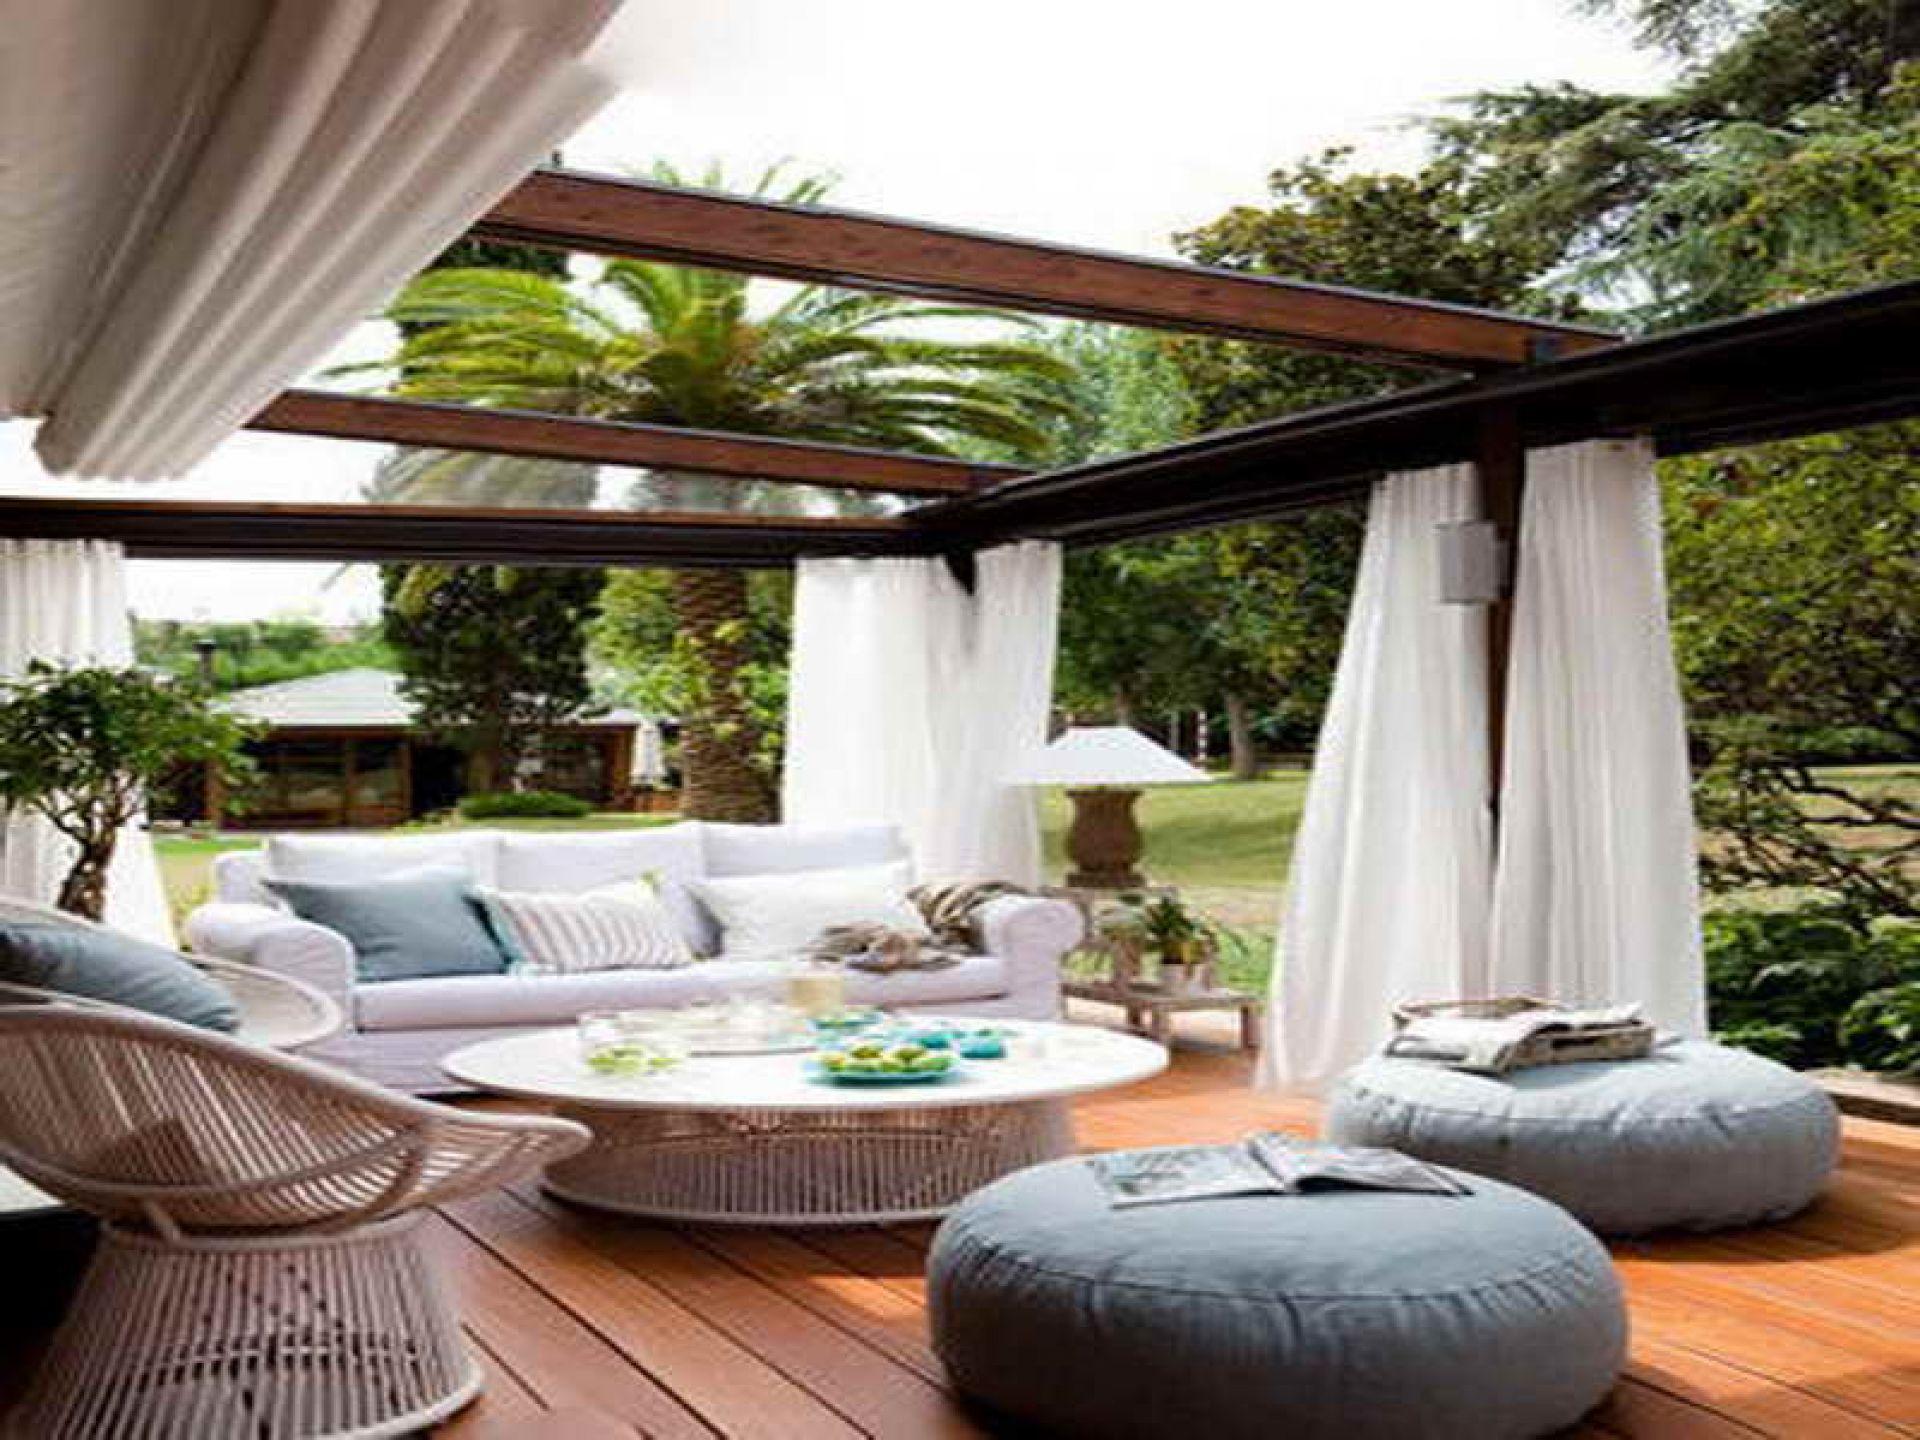 outdoor patio ideas visual designs also images fresh inspiration plain outdoor  patio BXUJFLC